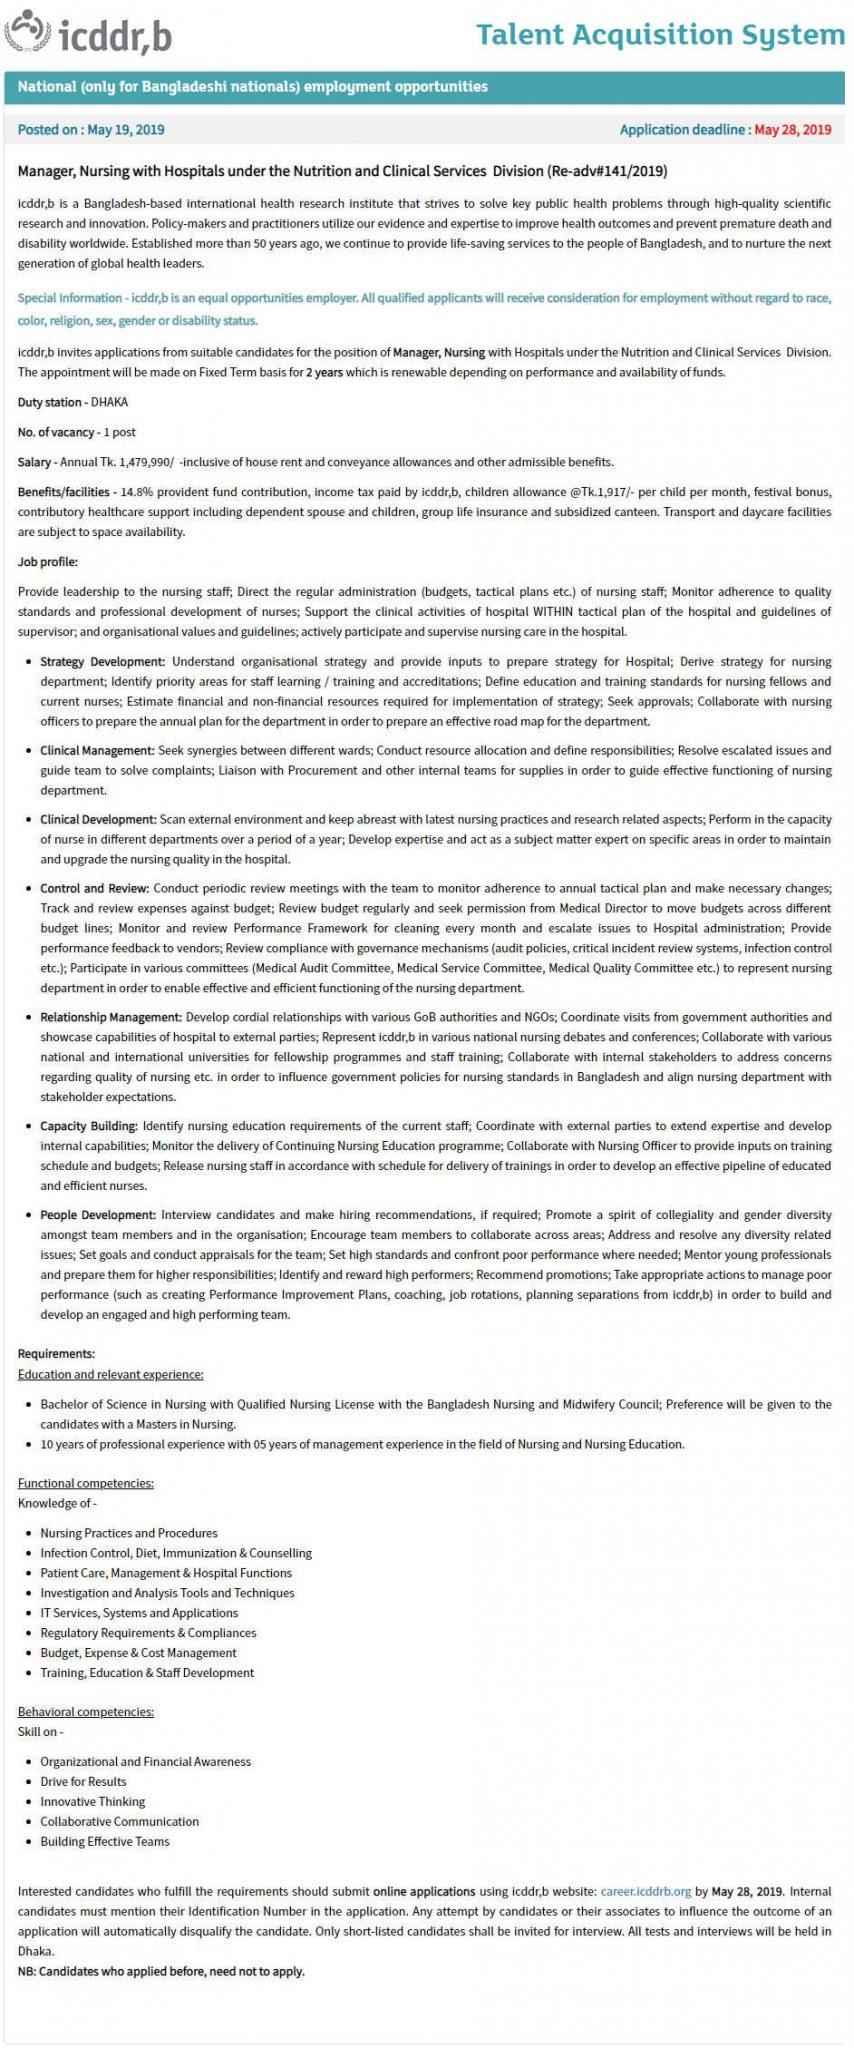 International Centre for Diarrhoeal Disease Research, Bangladesh icddr,b job Circular 2019